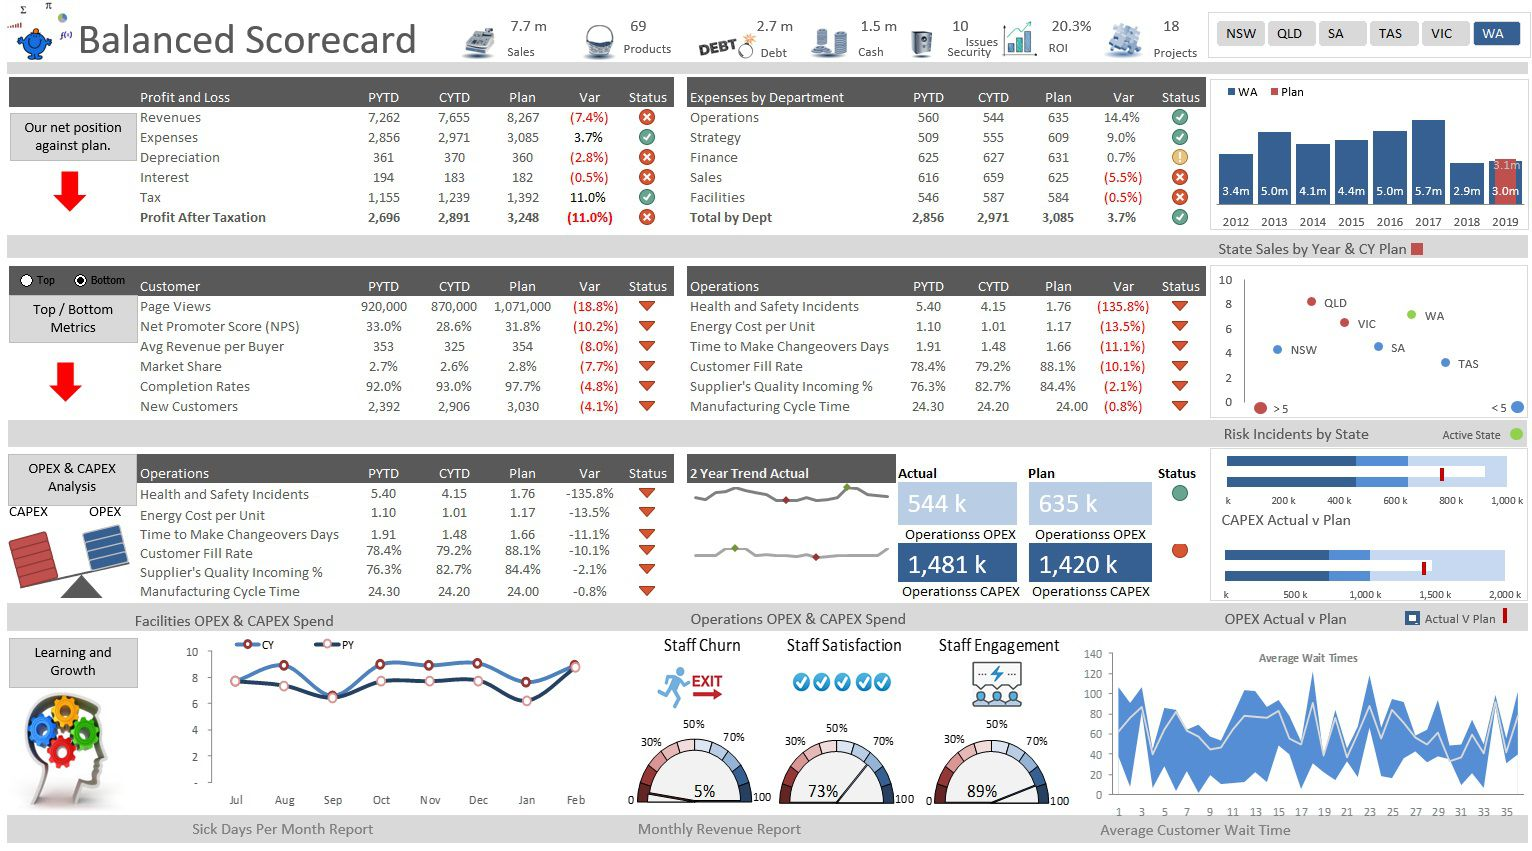 006 Surprising Balanced Scorecard Excel Template High Definition  Dashboard Download HrFull